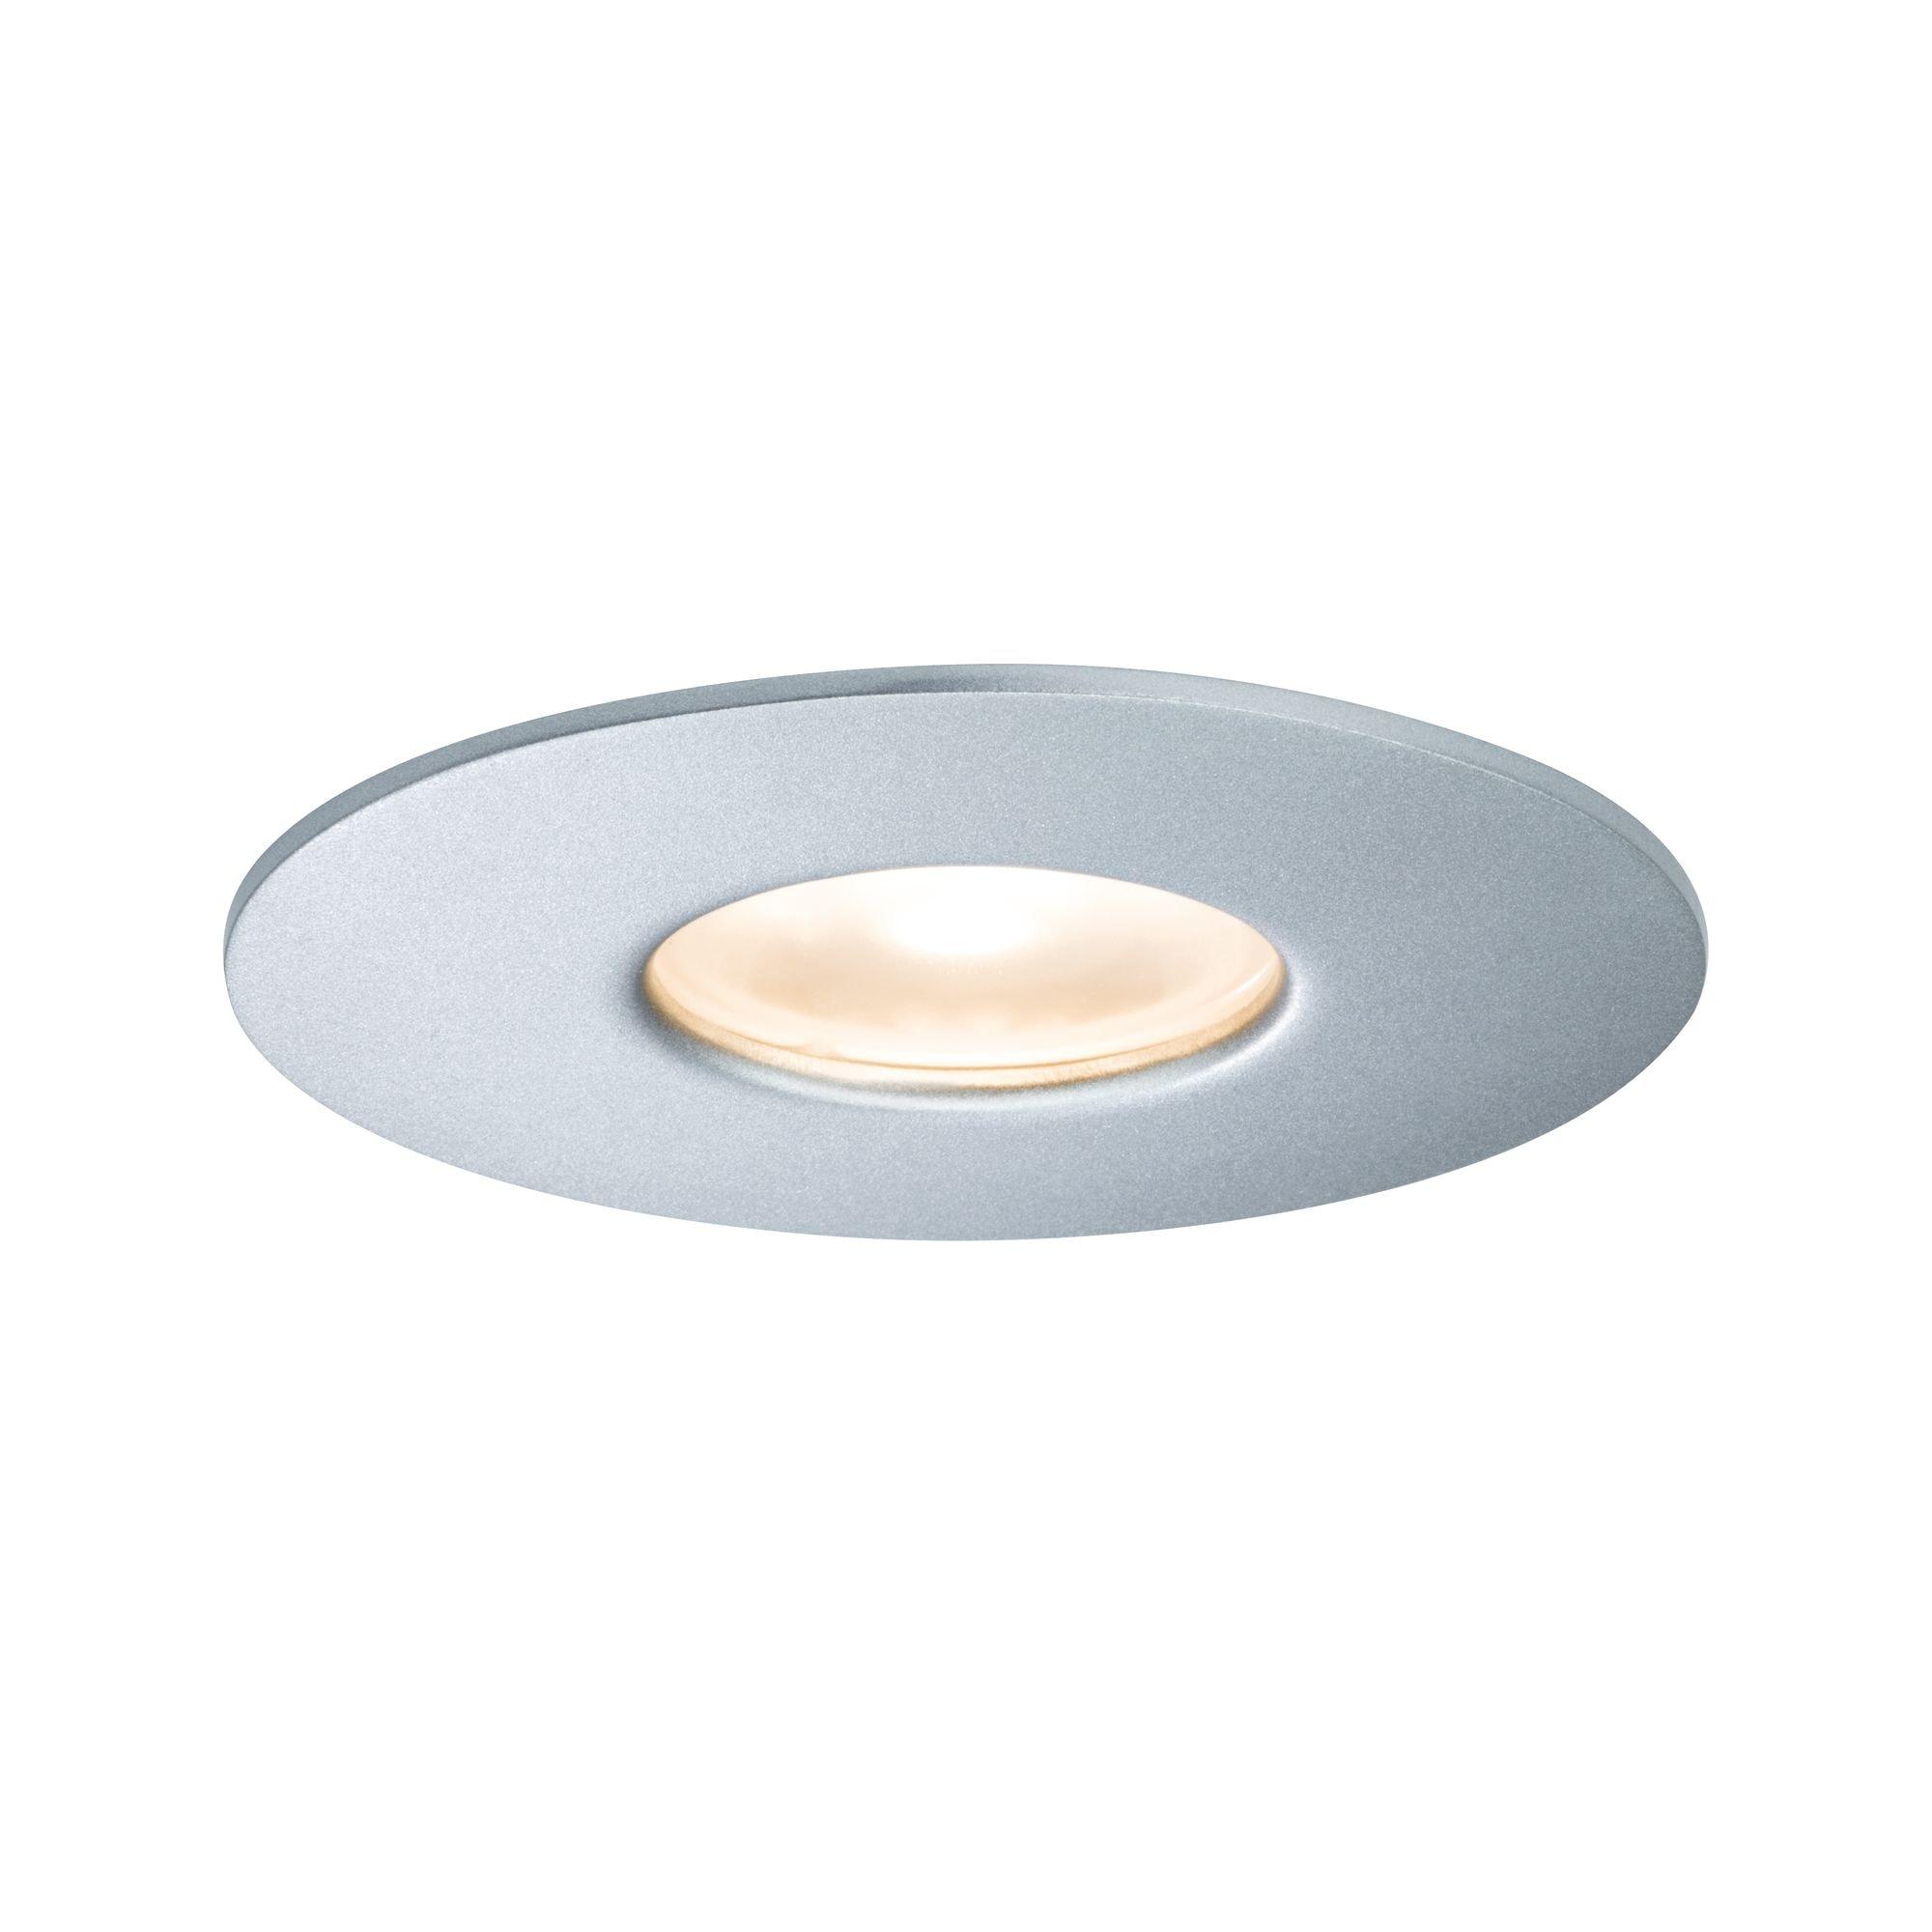 Paulmann LED Einbaustrahler House 34° 5,8W Silber, 1 St., Warmweiß